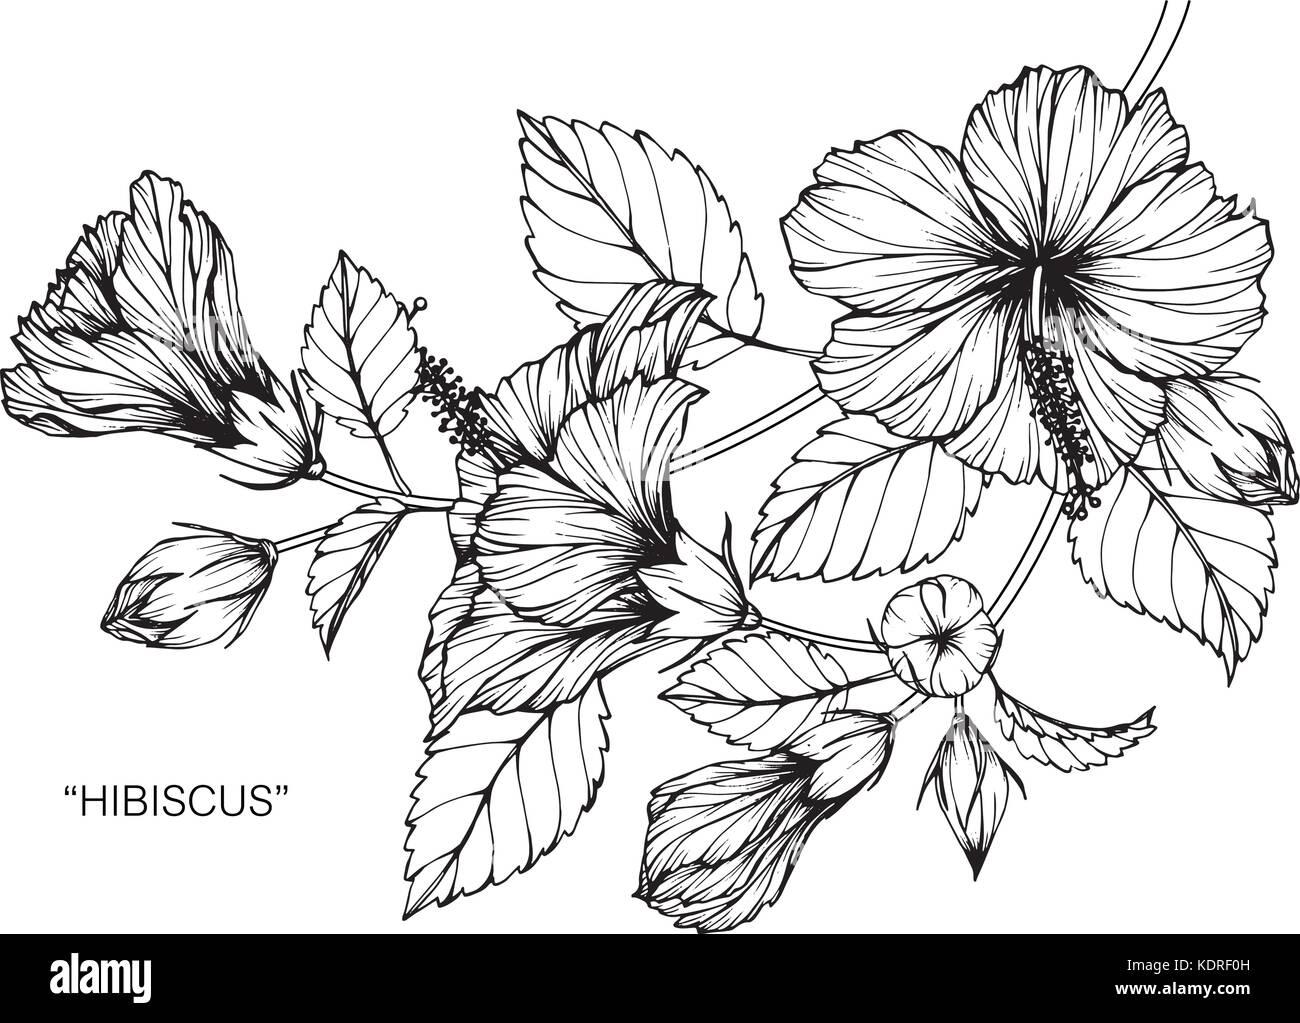 Hawaiian hibiscus flower drawings animalcarecollegefo hawaiian hibiscus flower drawings izmirmasajfo